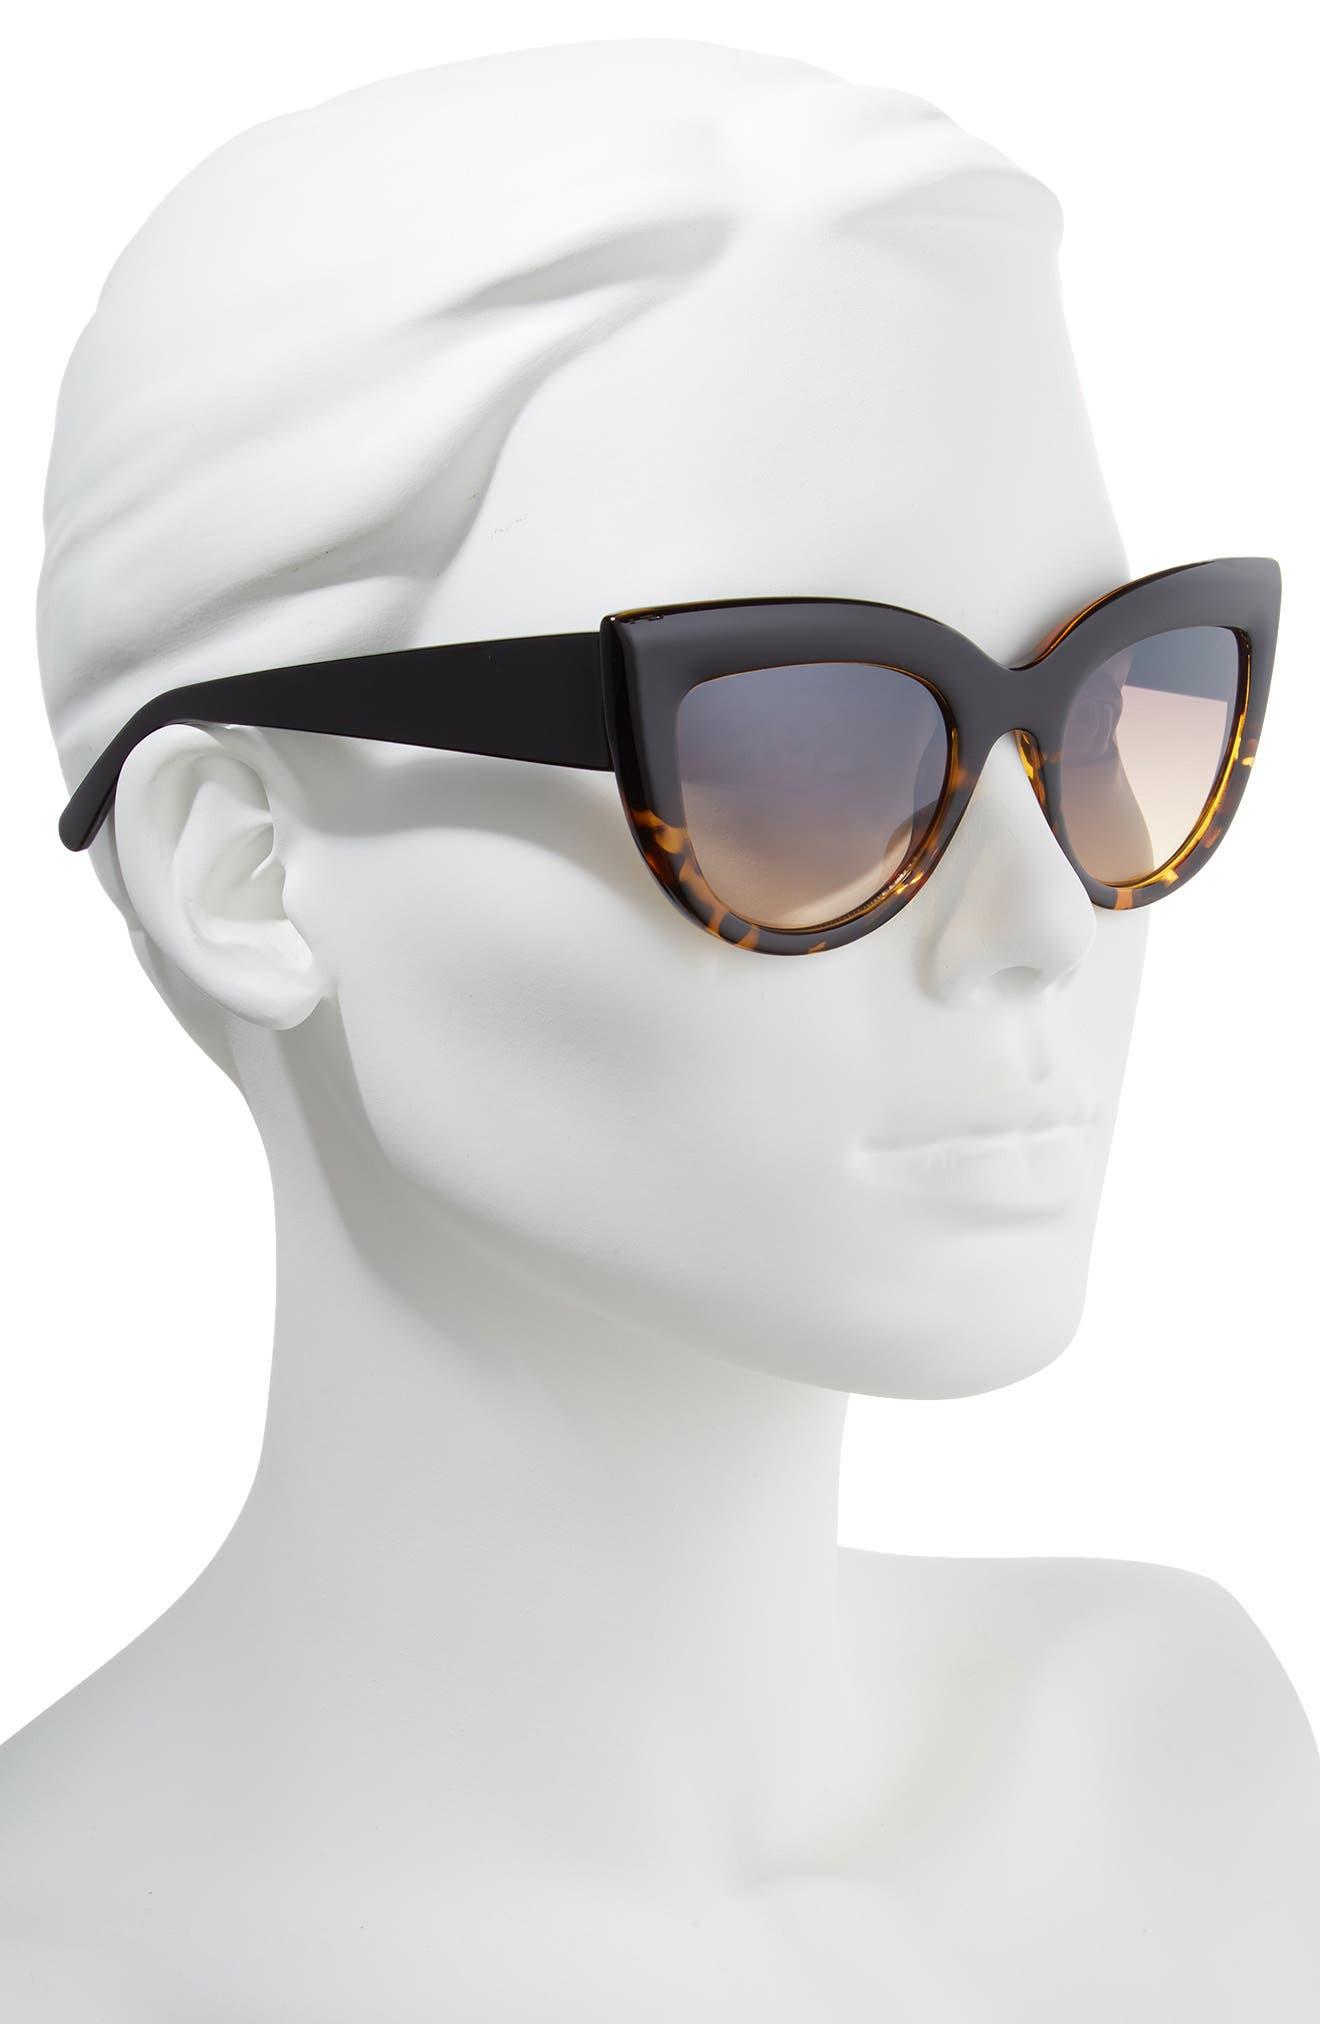 60mm Two-Tone Cat Eye Sunglasses,                             Alternate thumbnail 2, color,                             Black/ Tort